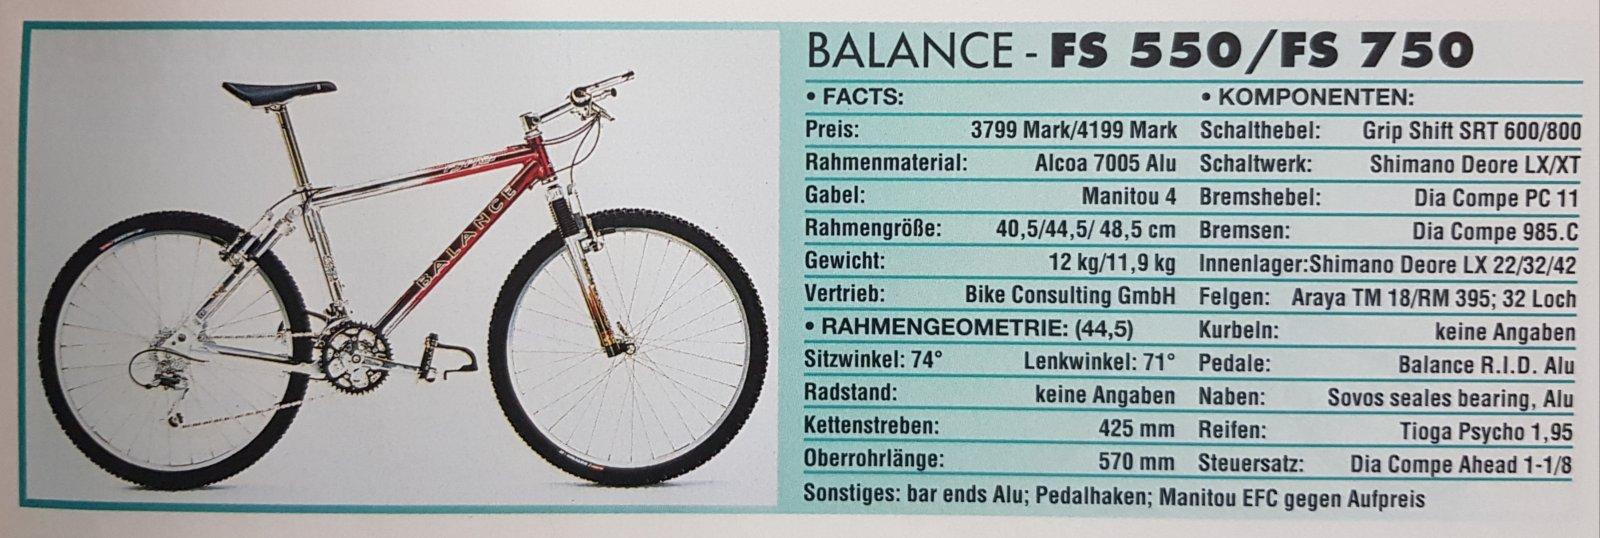 Balance FS550-750 1995.jpg